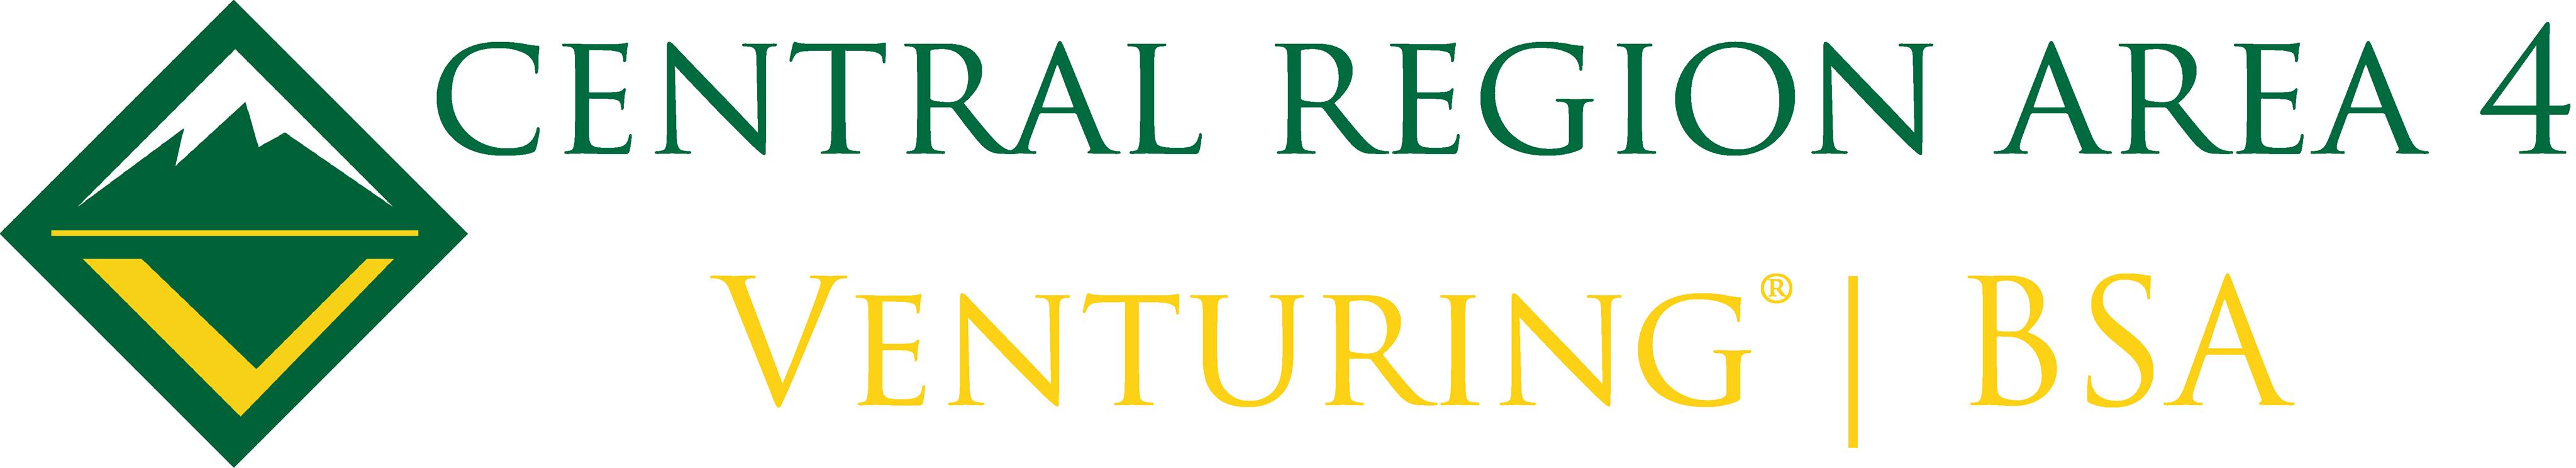 Central Region Area 4 Venturing